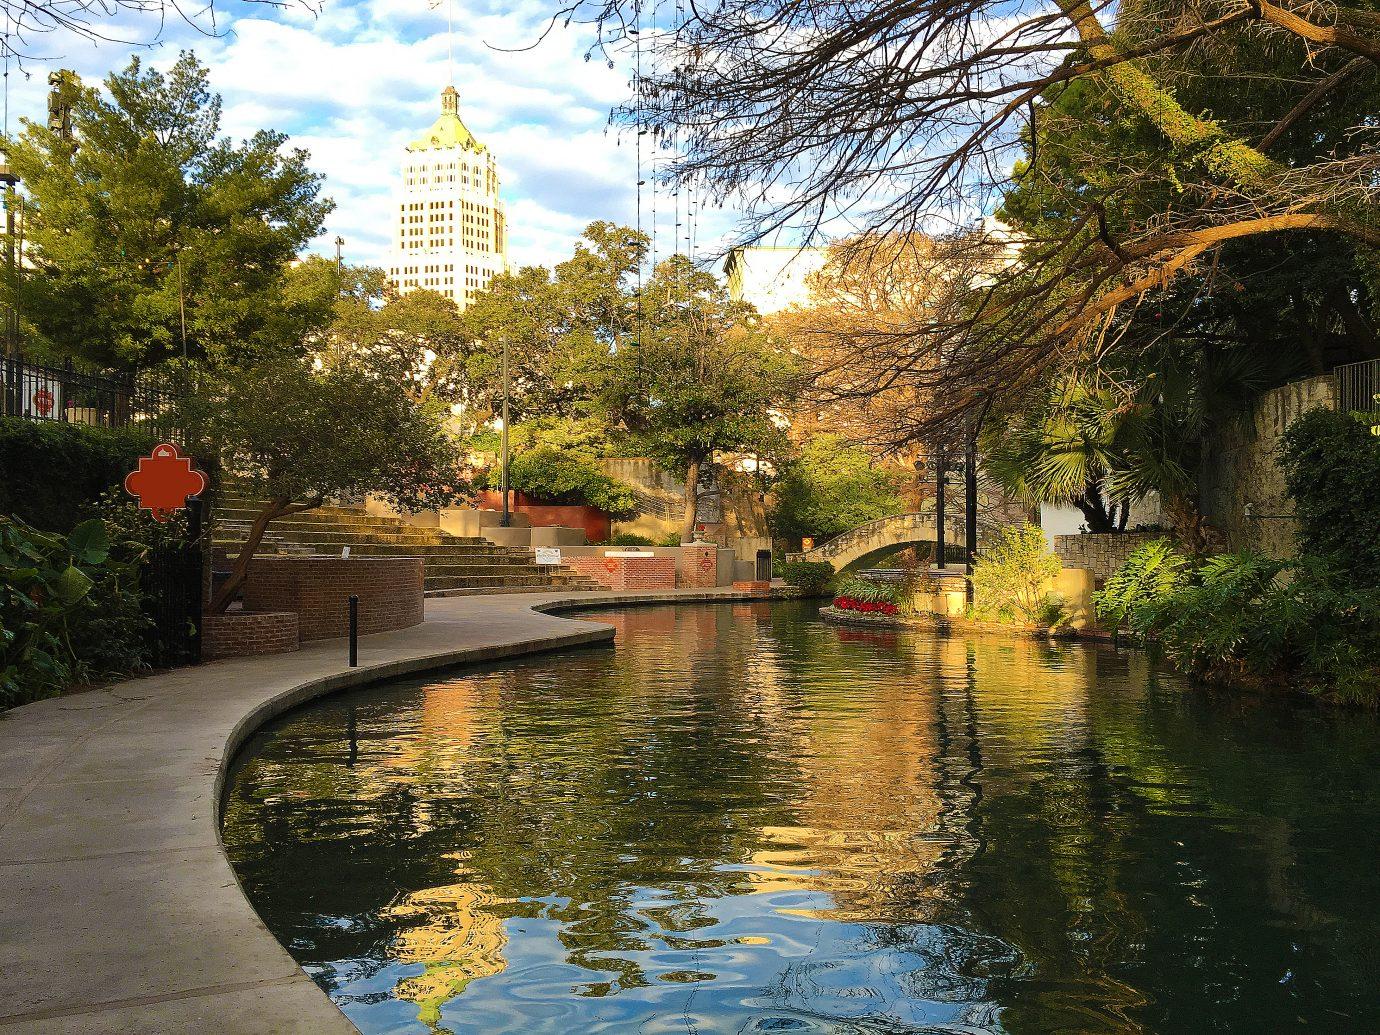 Beautiful view of the San Antonio Riverwalk